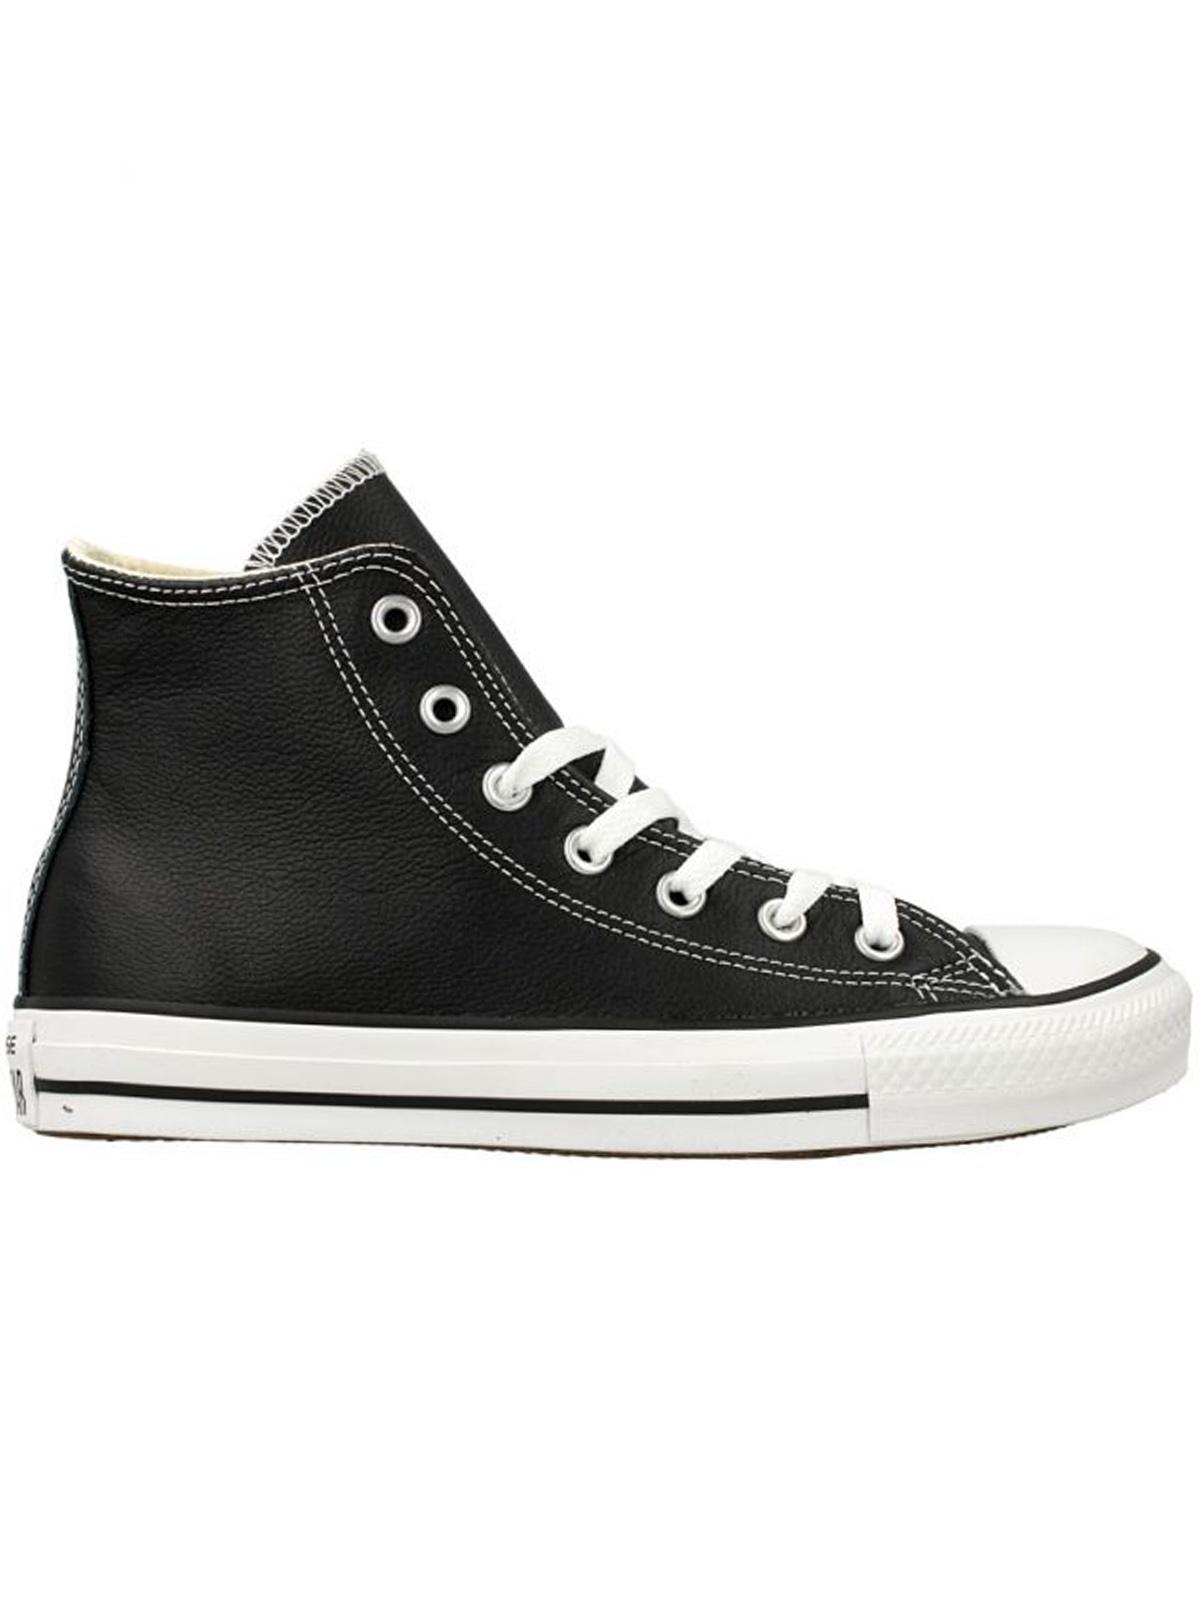 Converse All Star Hi Leather - CONVERSE - Citysport 085b6784832